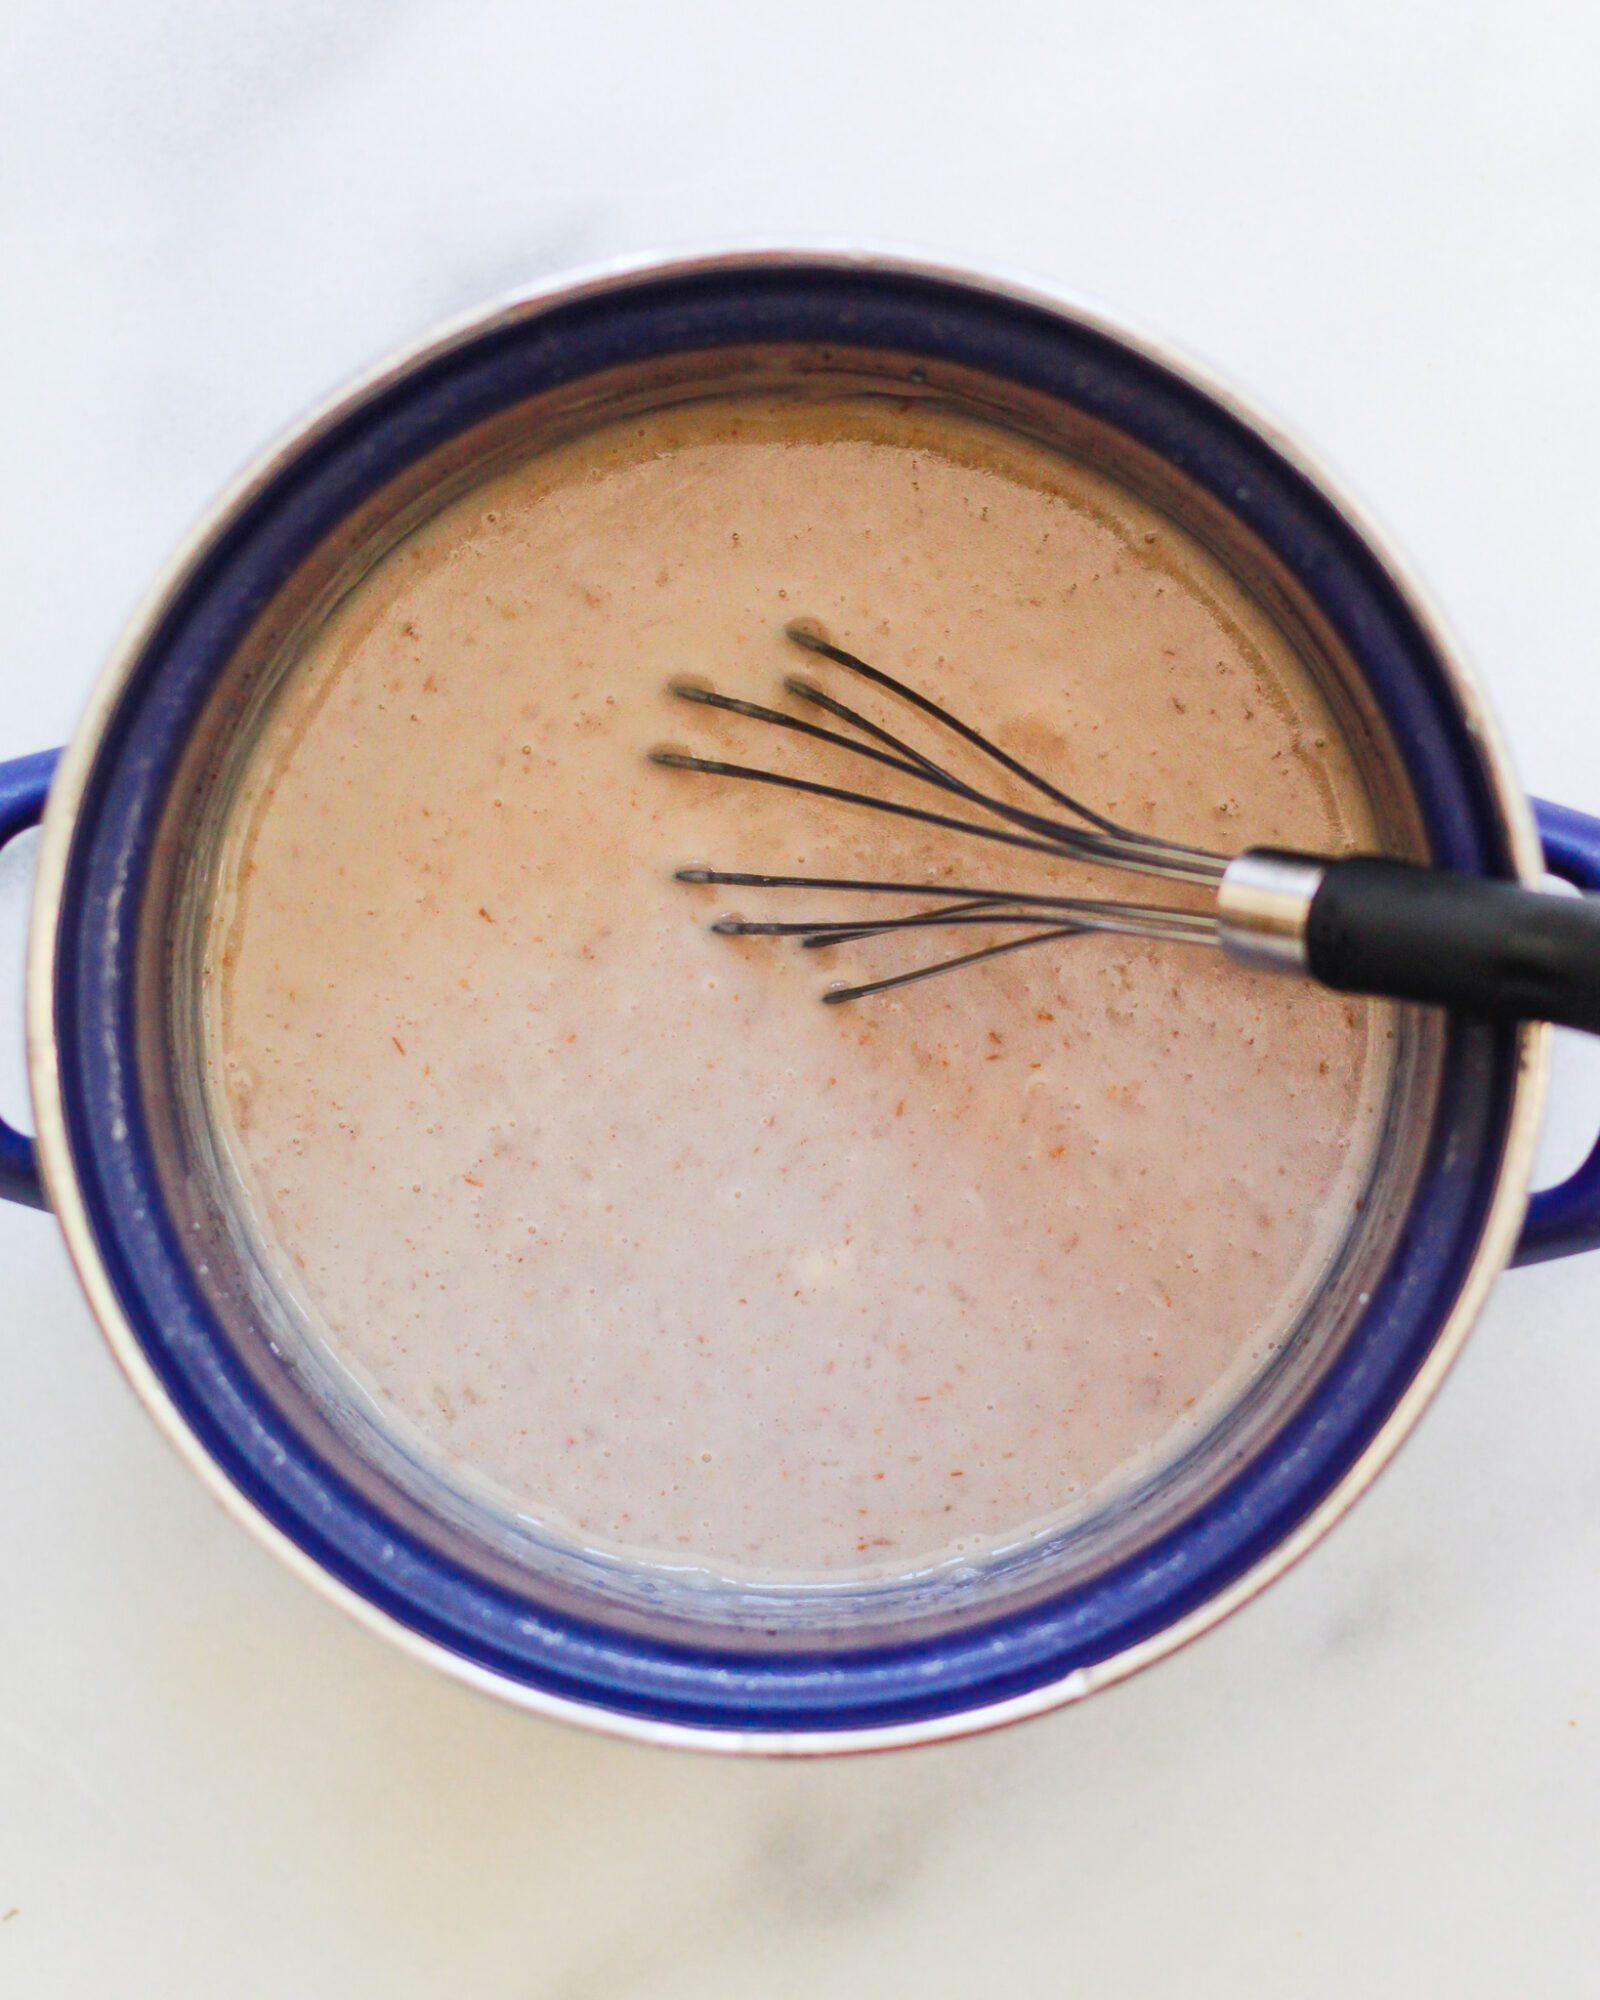 pot with butterscotch pudding